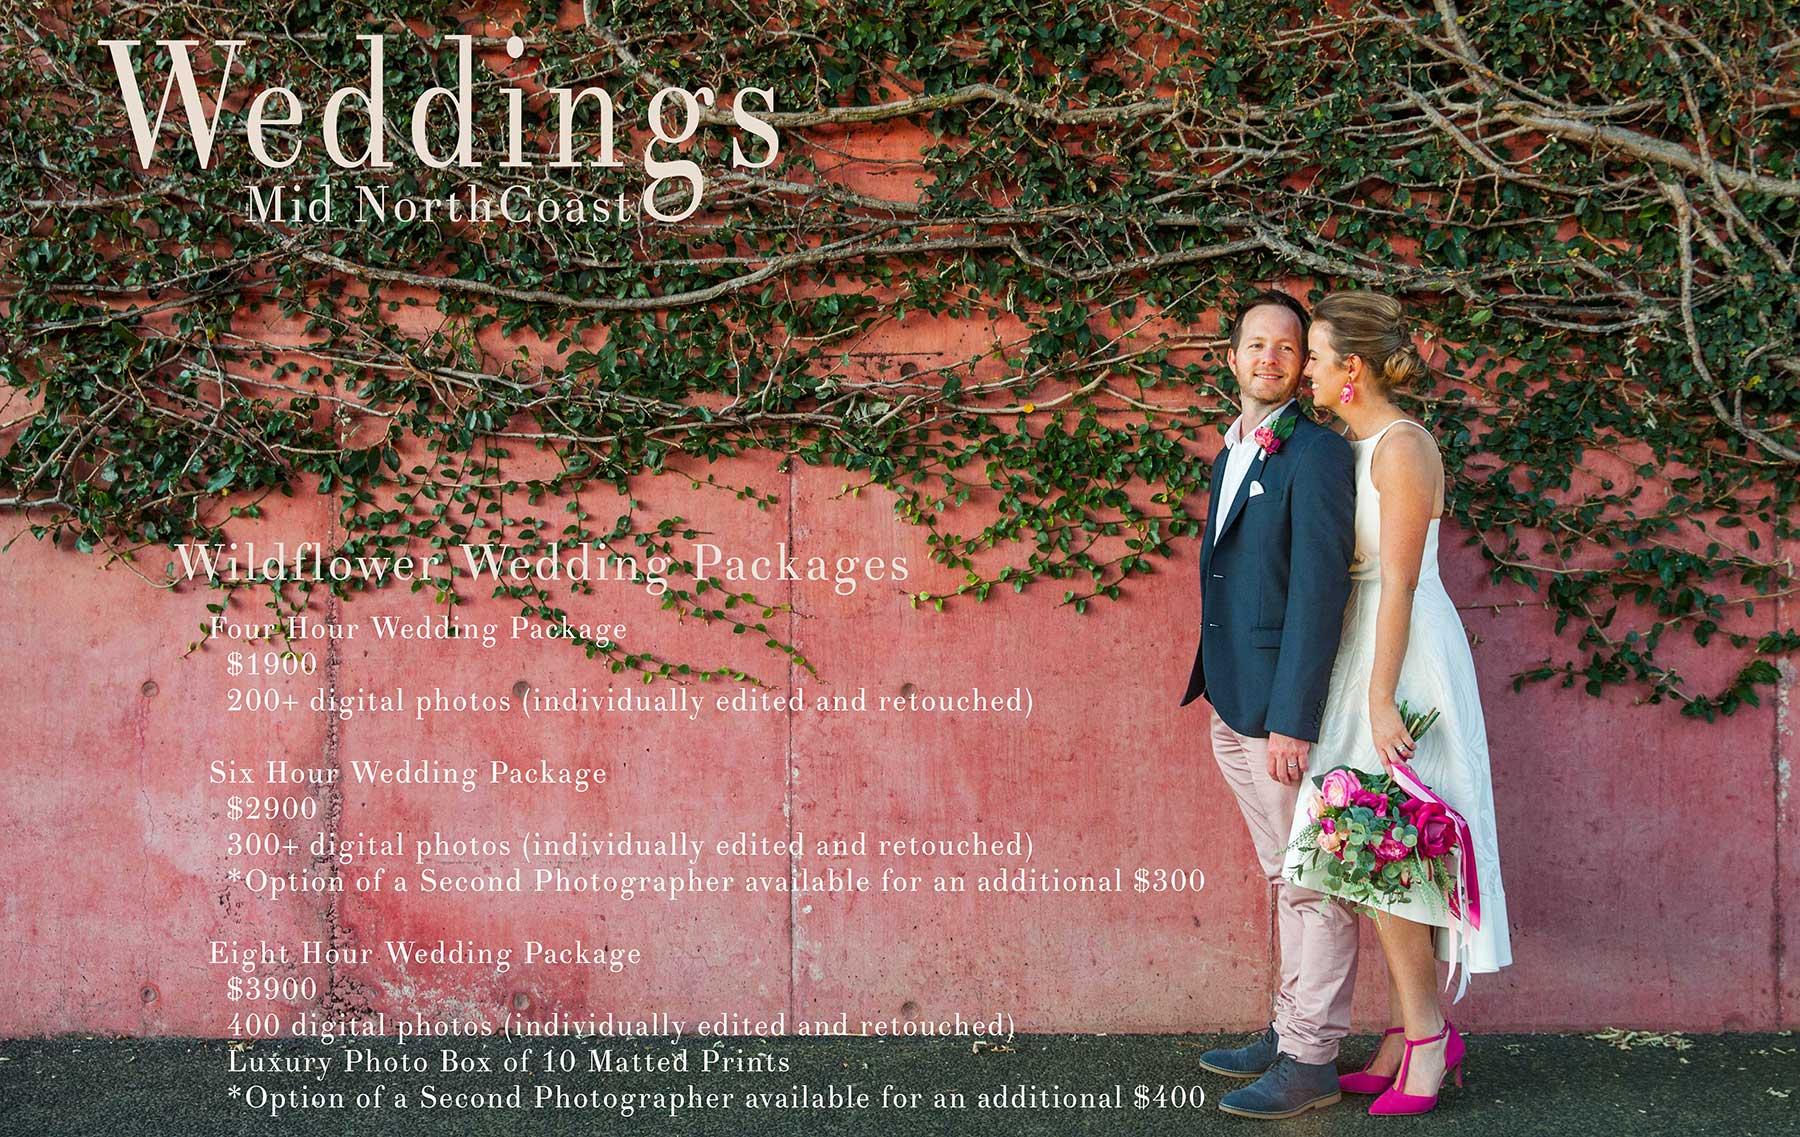 Crescent Head and Mid North Coast Wedding Photographer